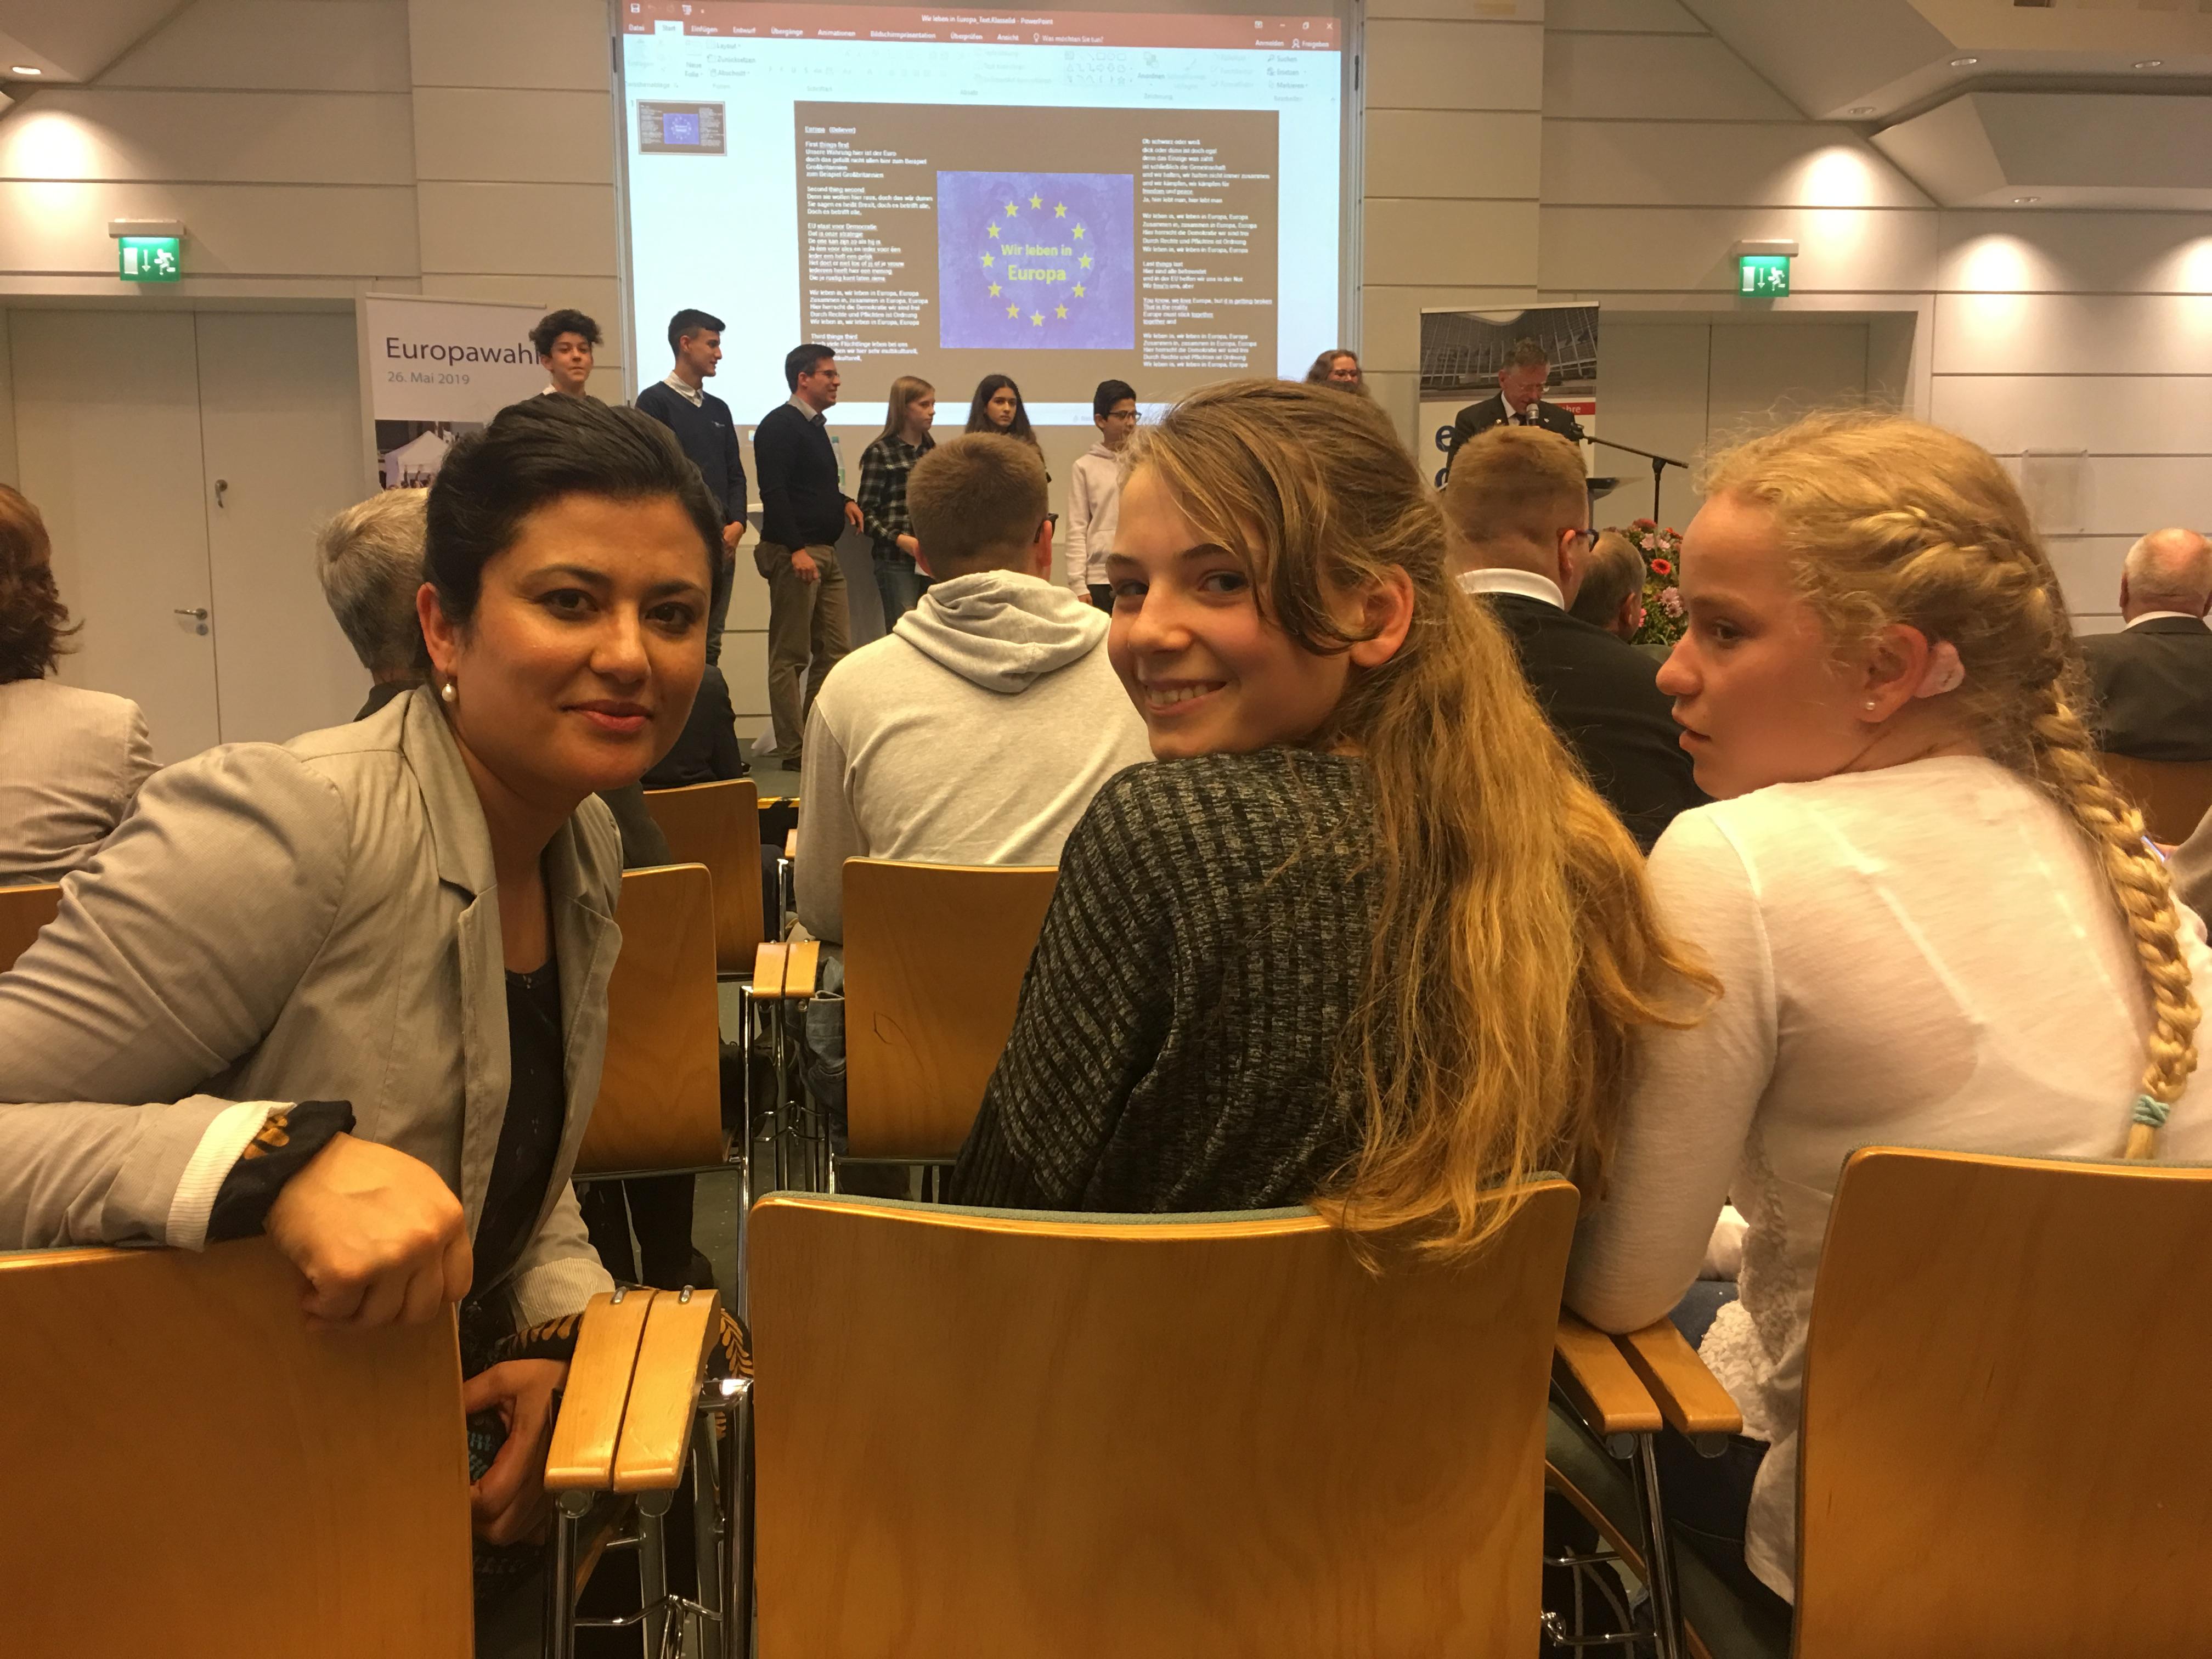 Den Europatag feierte unsere EU-Kandidatin Fayaz mit eu-engagierten Schülerinnen und Schülern inNeuss